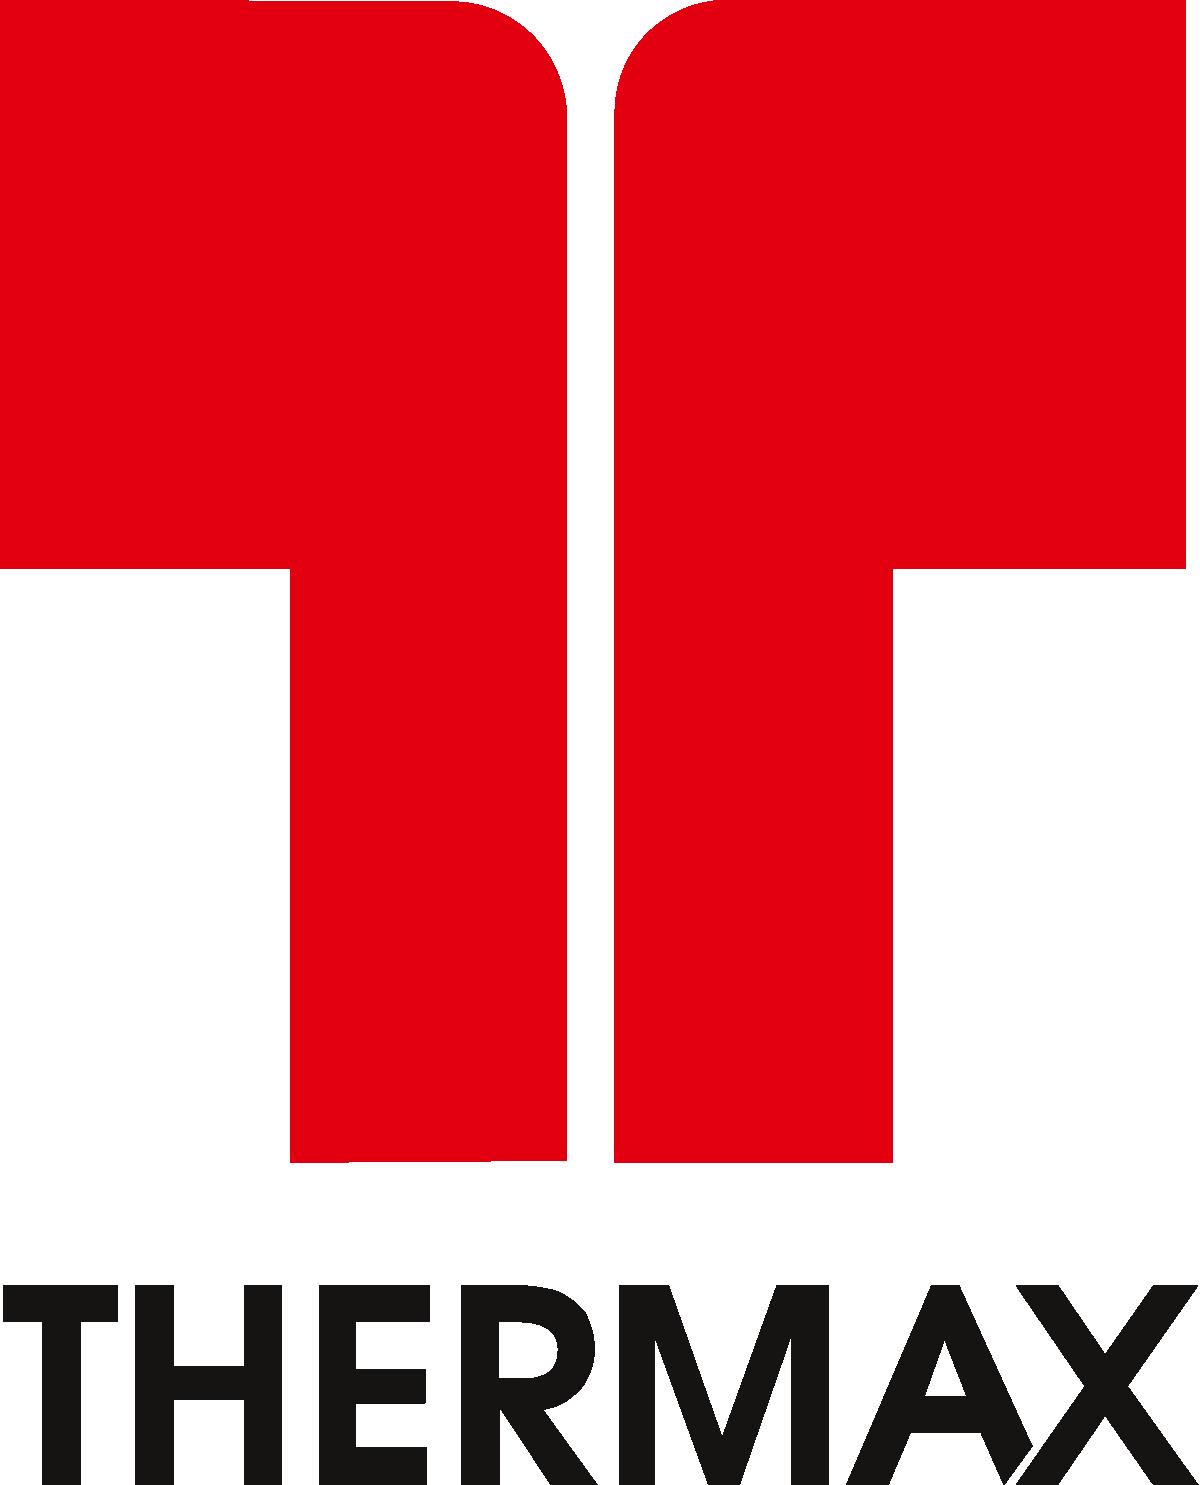 themax logo